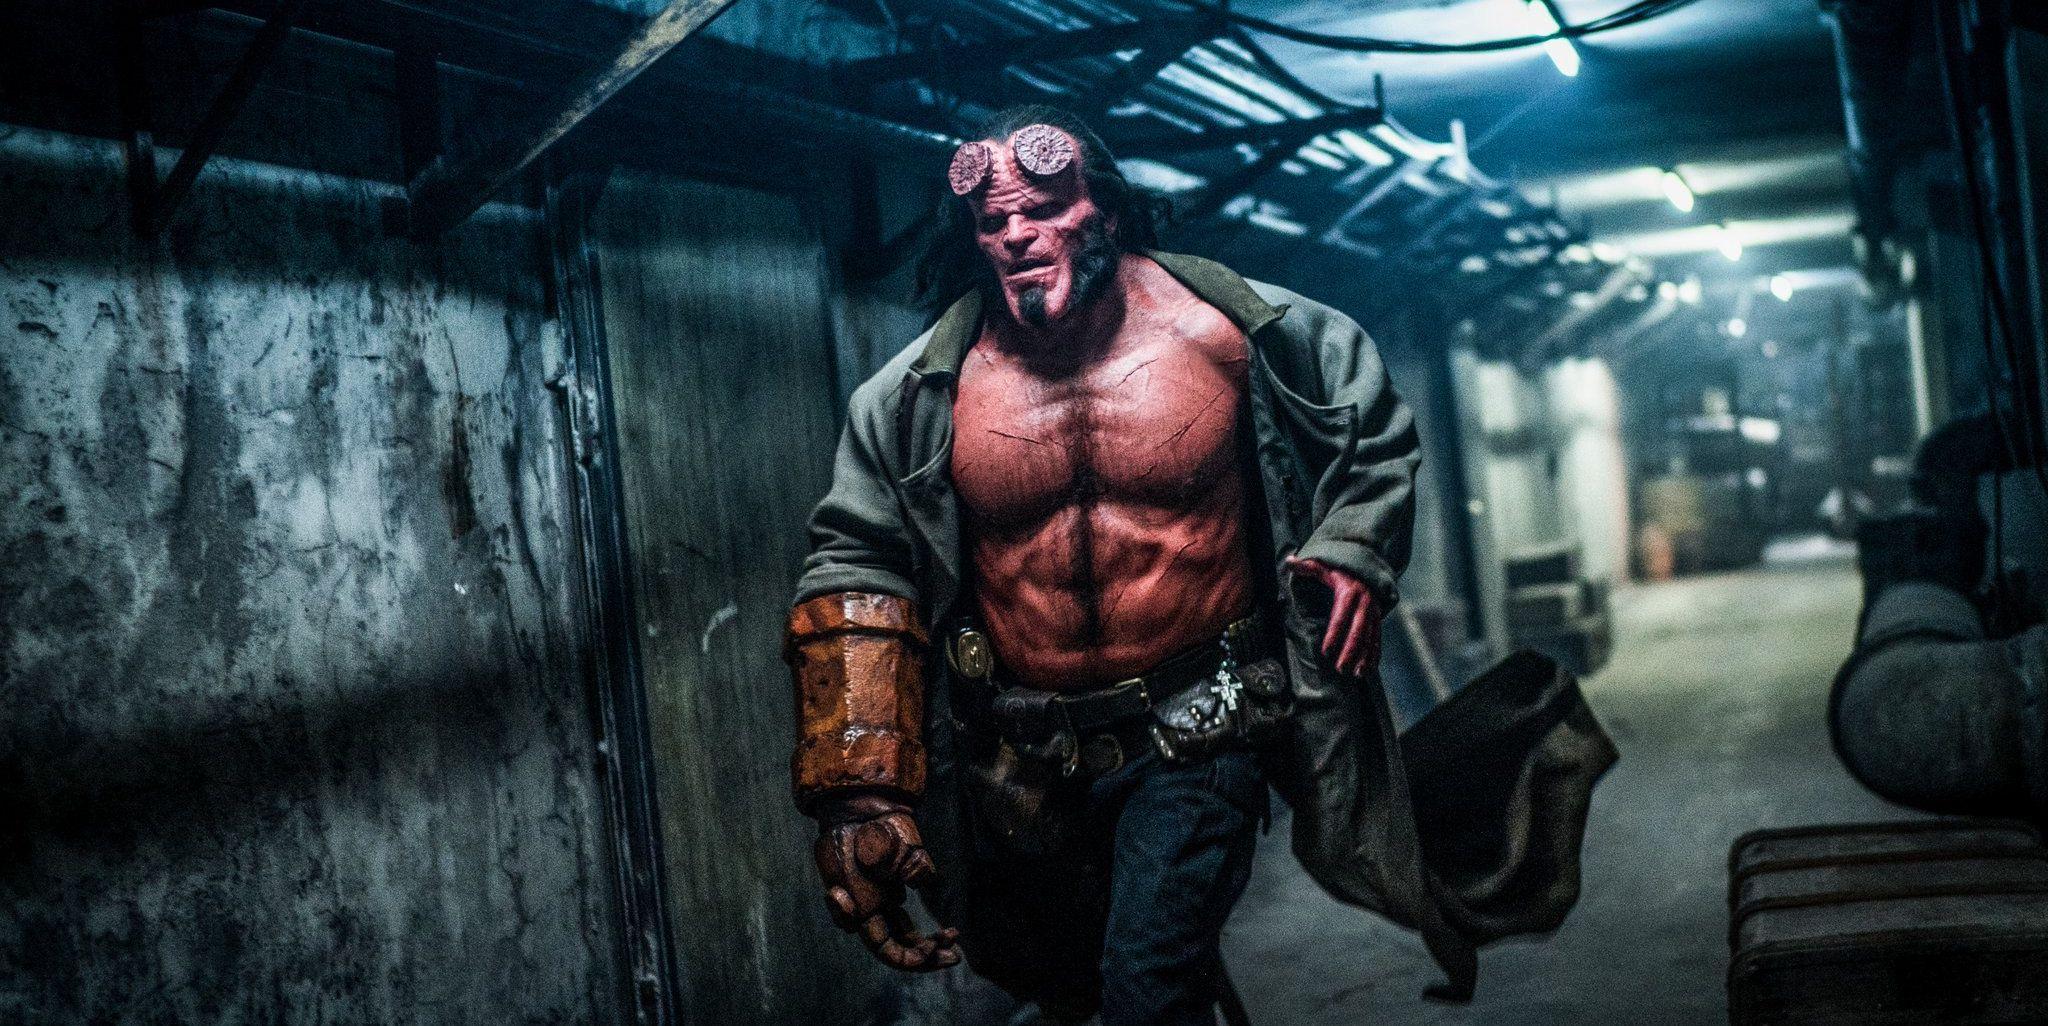 Check hier de trailer van de nieuwe Hellboy!